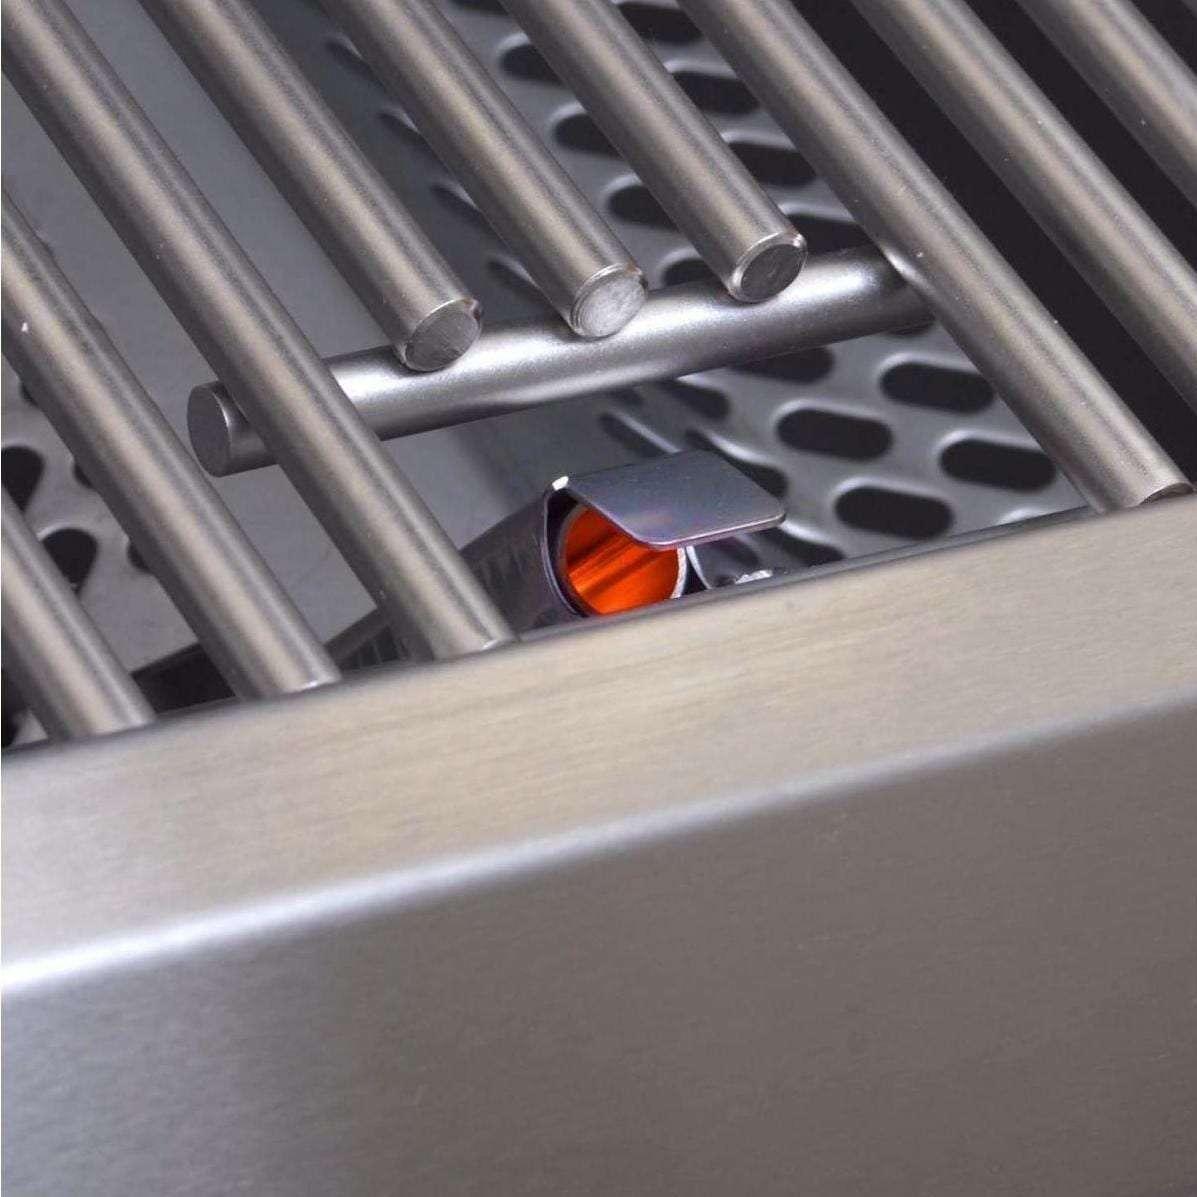 Fire Magic Echelon Diamond E660i Natural Gas Grill on Cart - Hot Surface Ignition